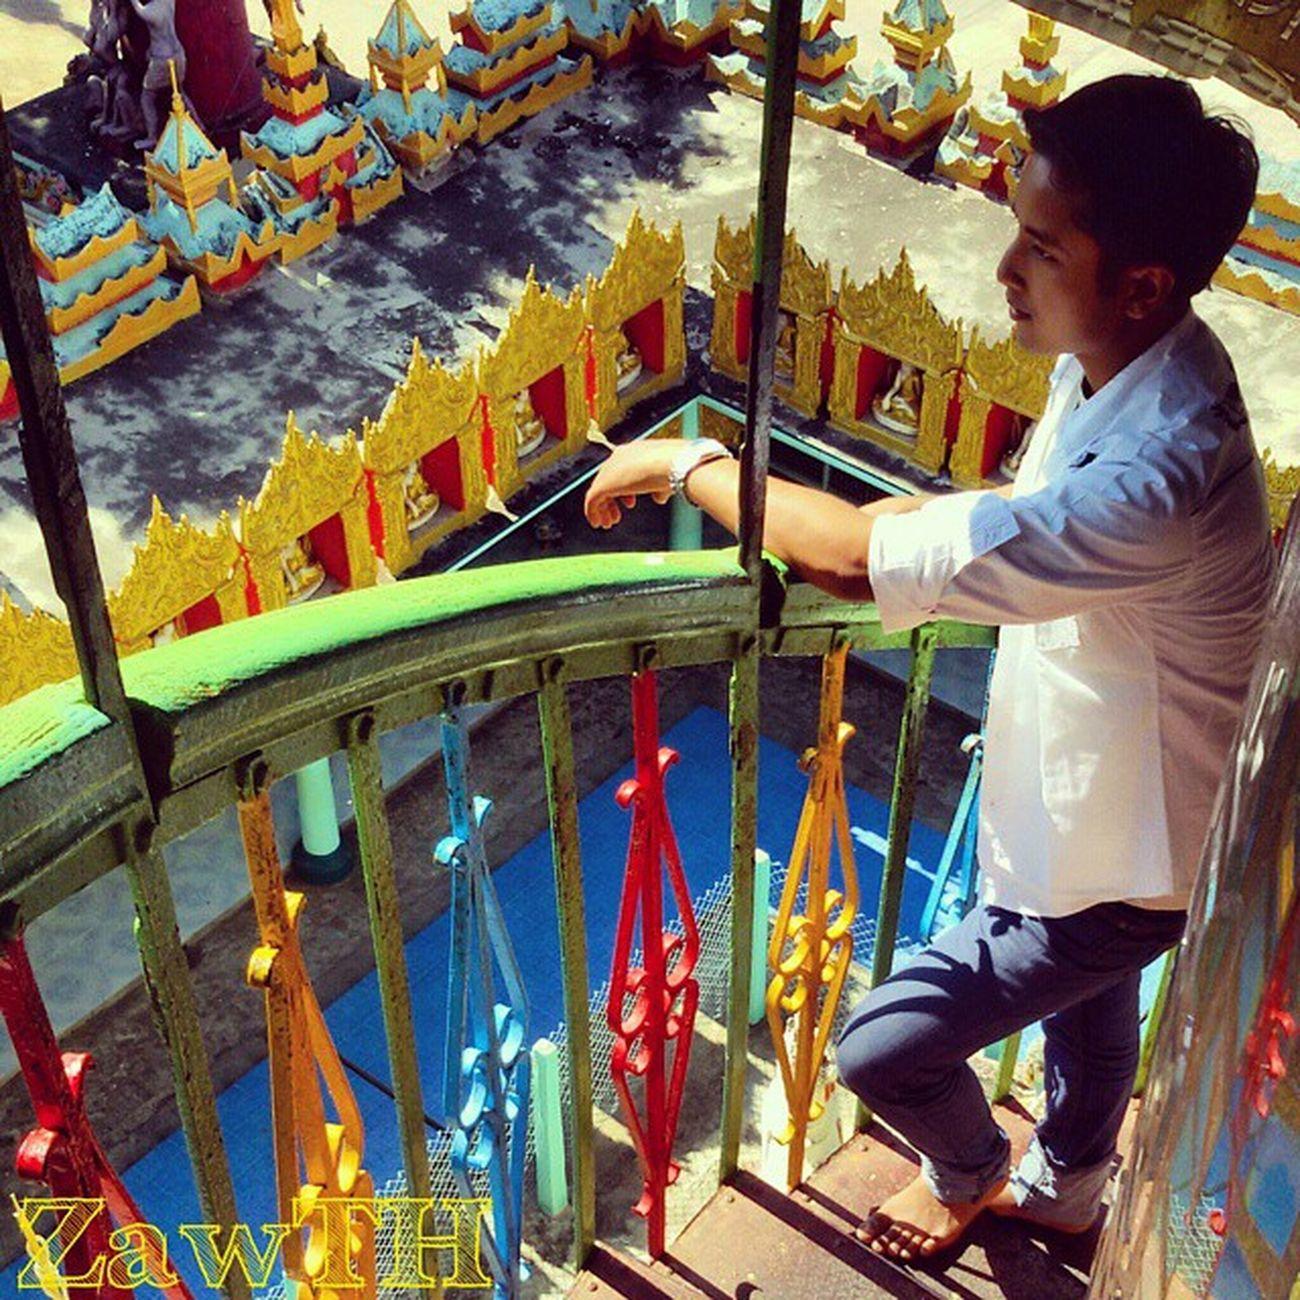 Staring from Spiral Staircase of Watch Tower. Monywa Sagaing Mandalay Myanmar Myanmarphotos Watchtower Spiralstaircase Igersmyanmar Igersmandalay Vscomyanmar Igglobal Zawth GalaxyGrand2 @nocrop_rc Rcnocrop